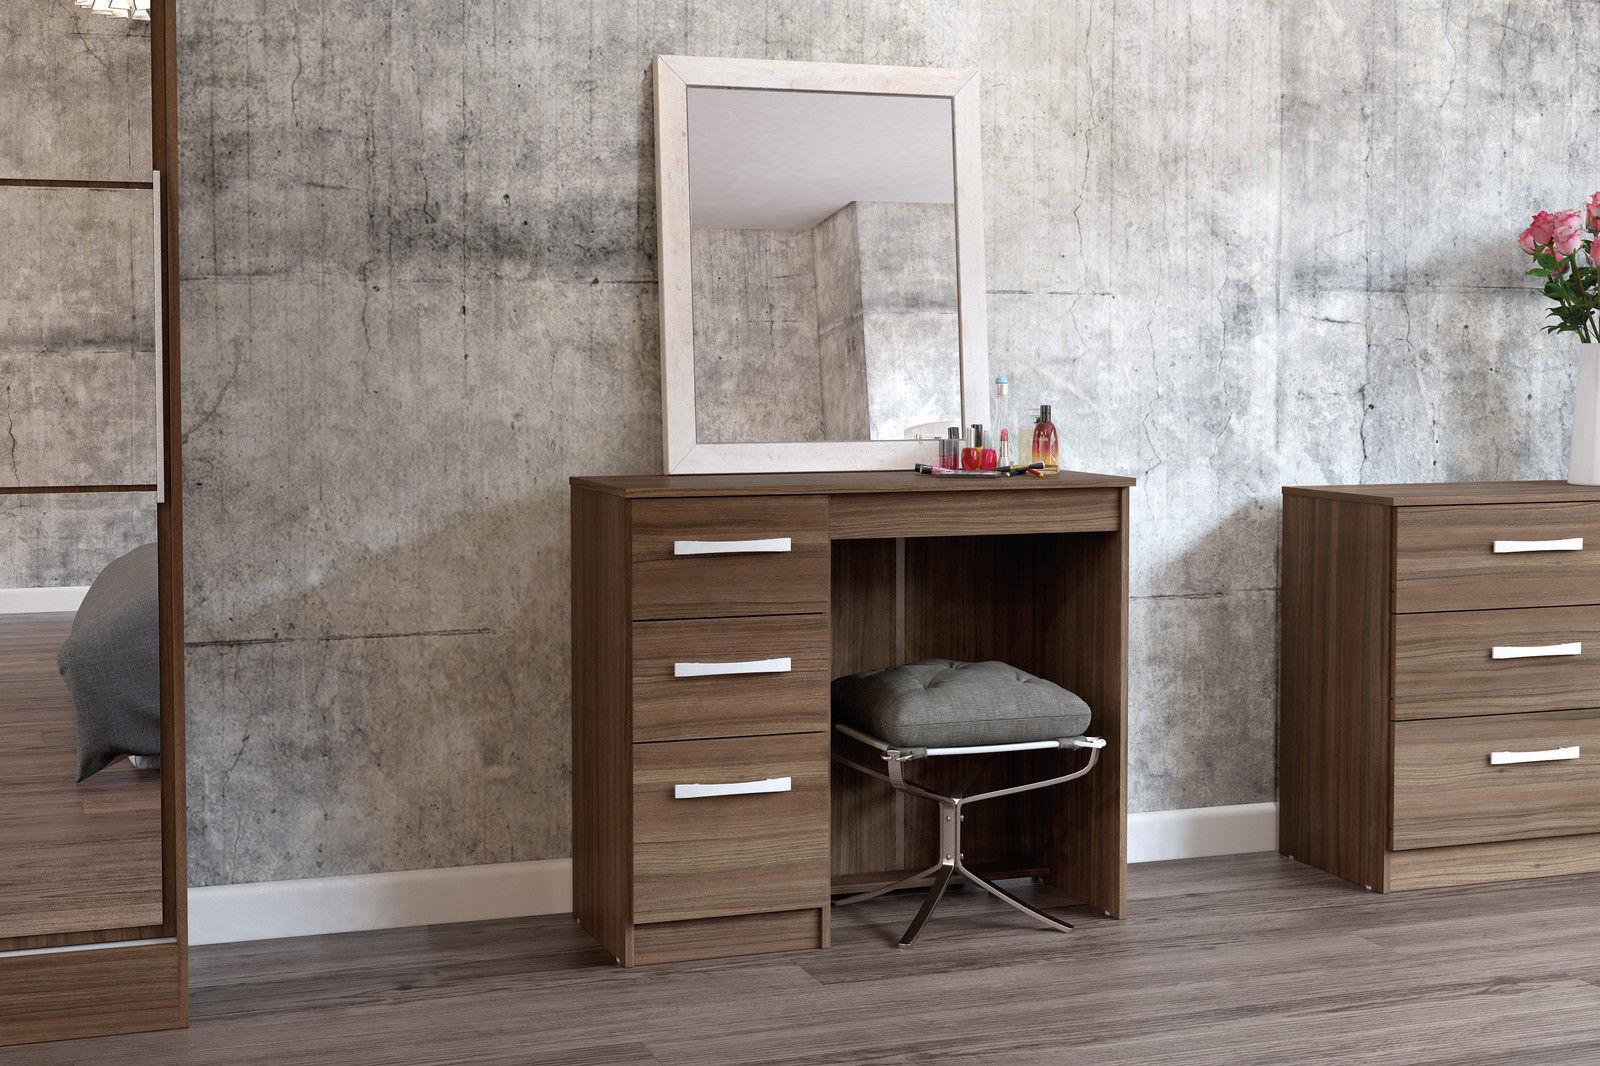 Birlea Lynx Walnut Gloss 3 Drawer Dressing Table Bedroom Furniture